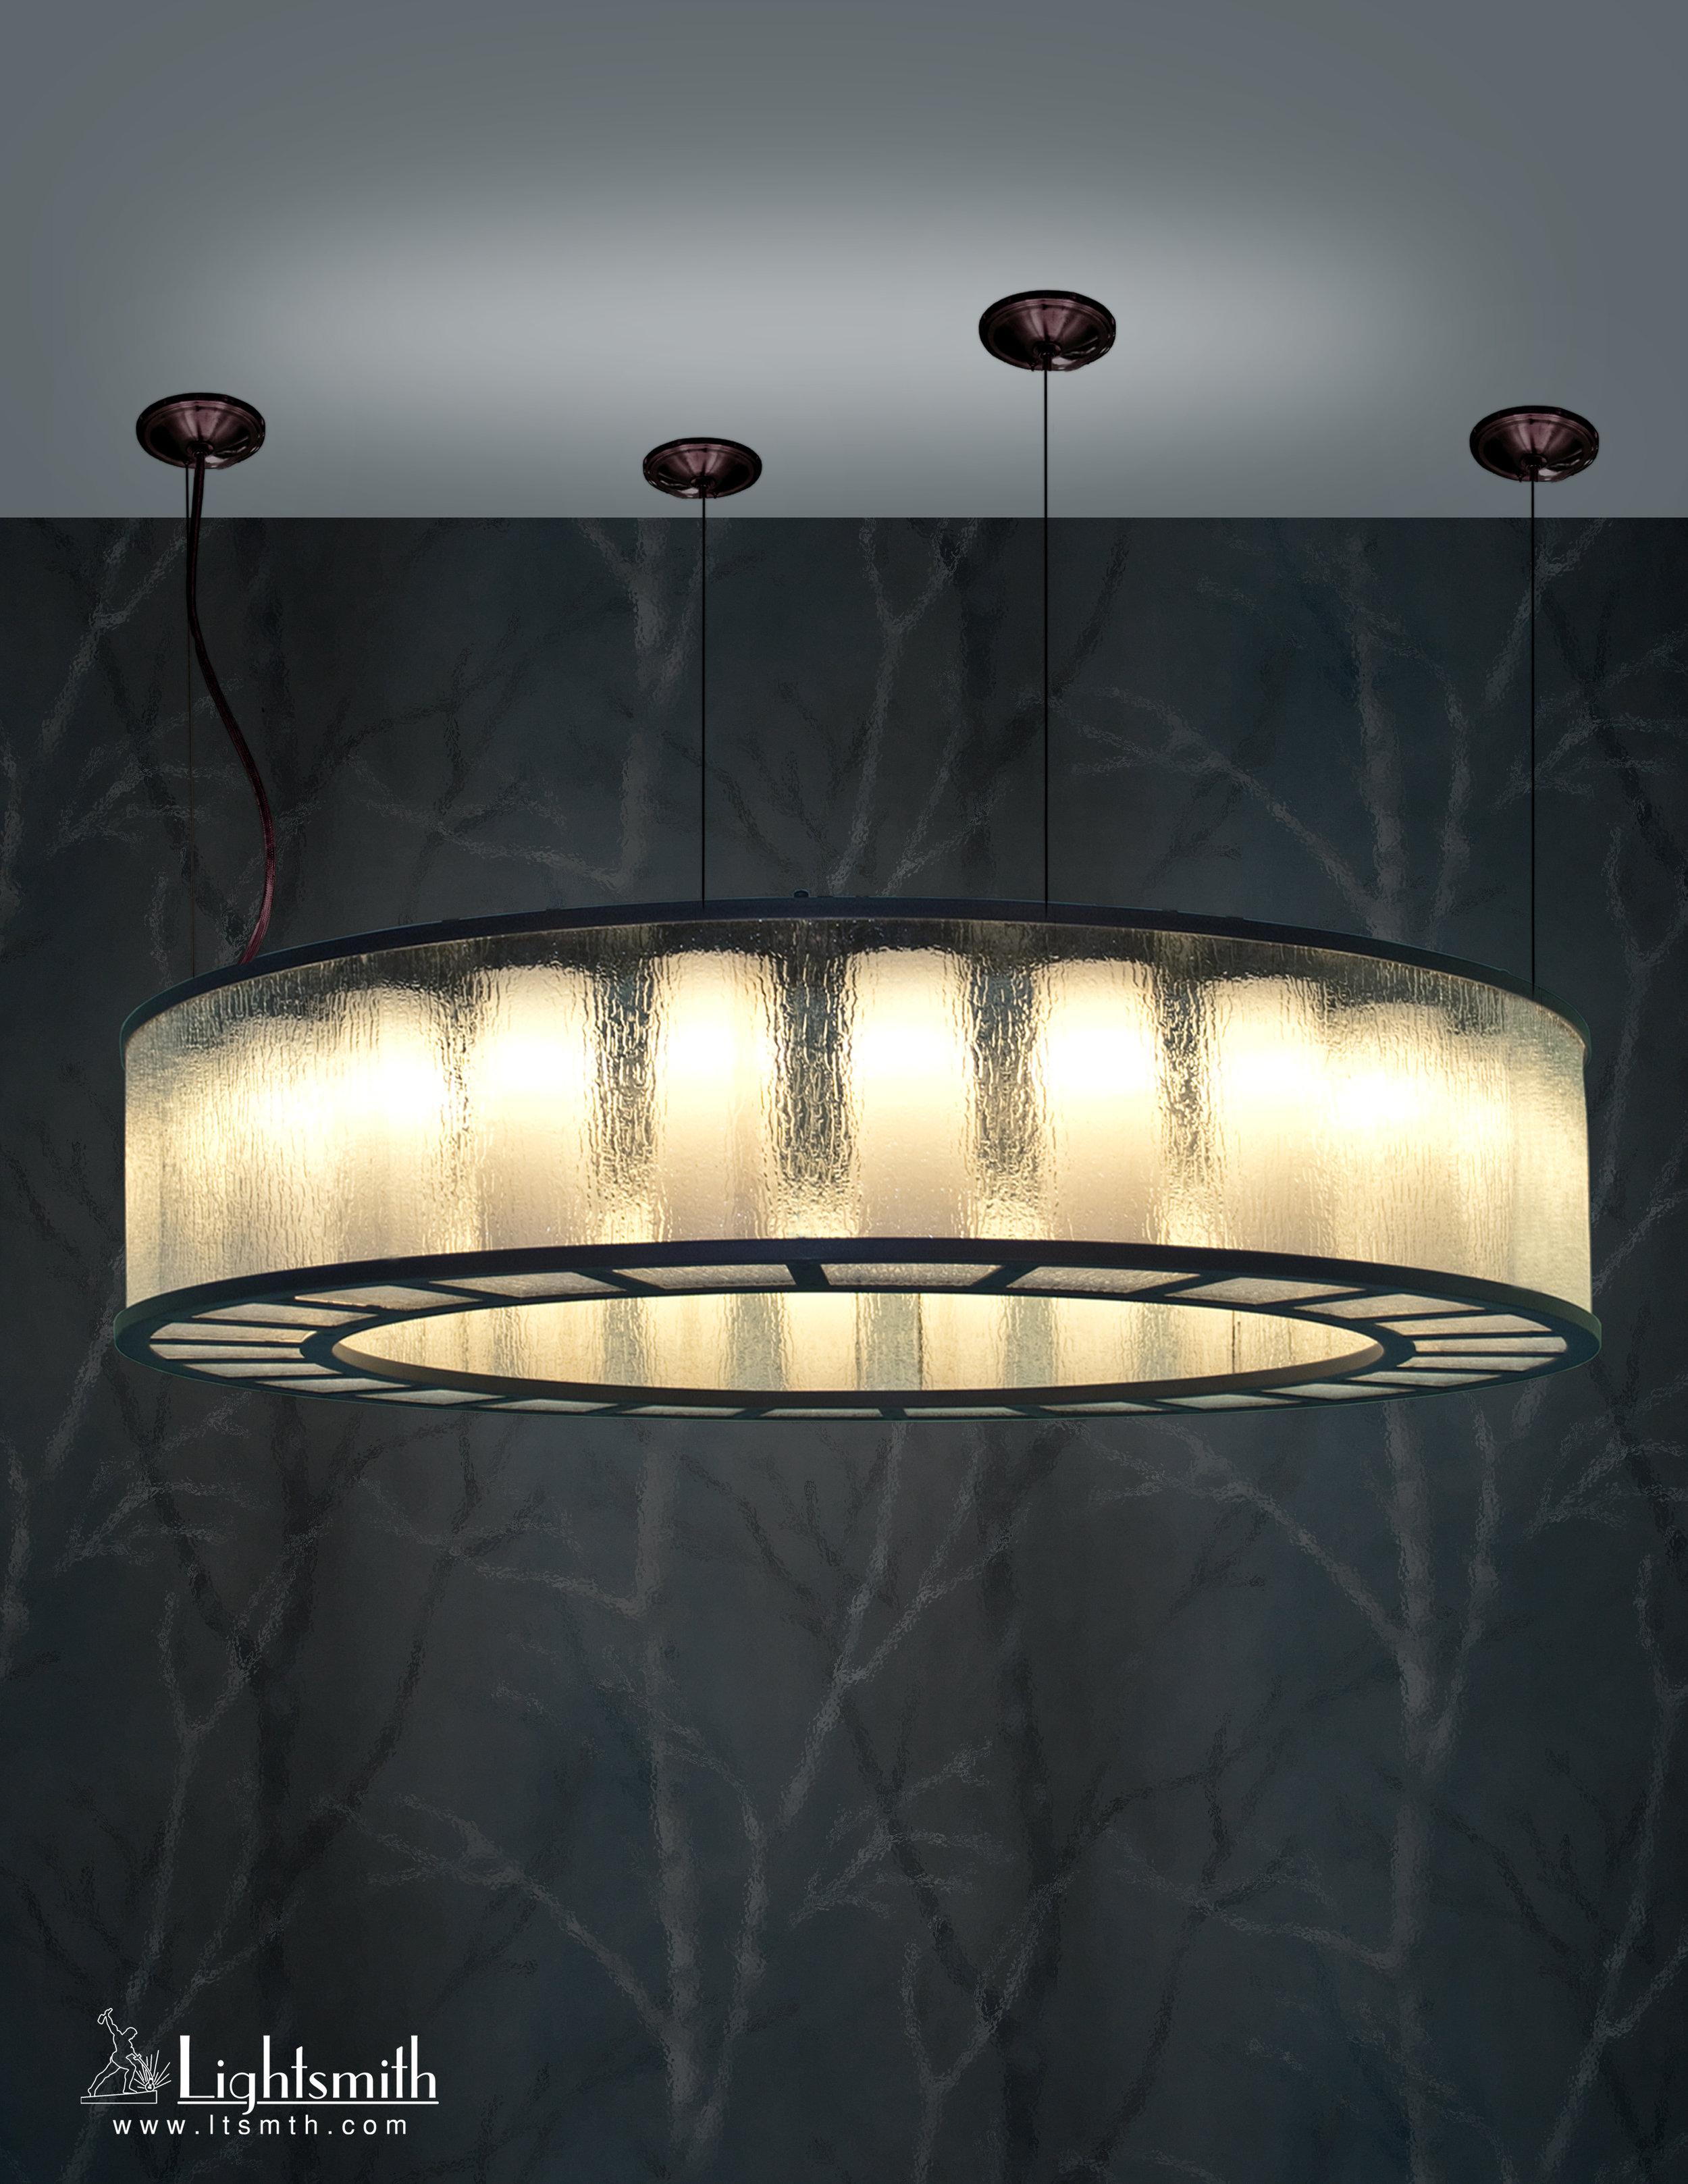 PD-10313 - Dark Bronze - Rain Acrylic Sides - White Opal Acrylic Cylinders Interior